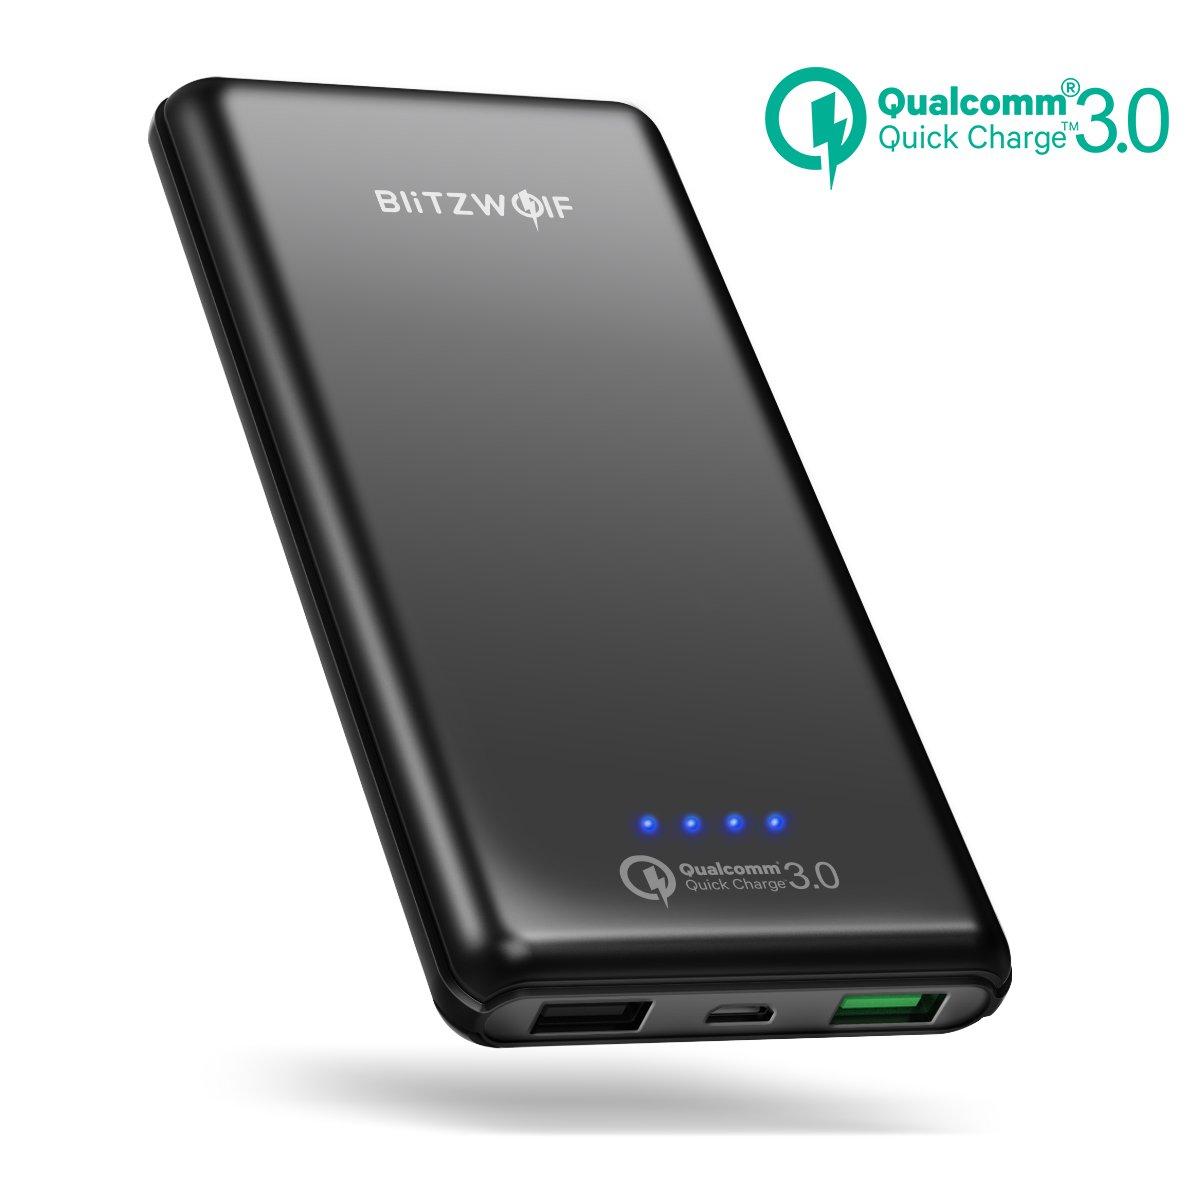 BlitzWolf QuickCharge 3.0 10000mah